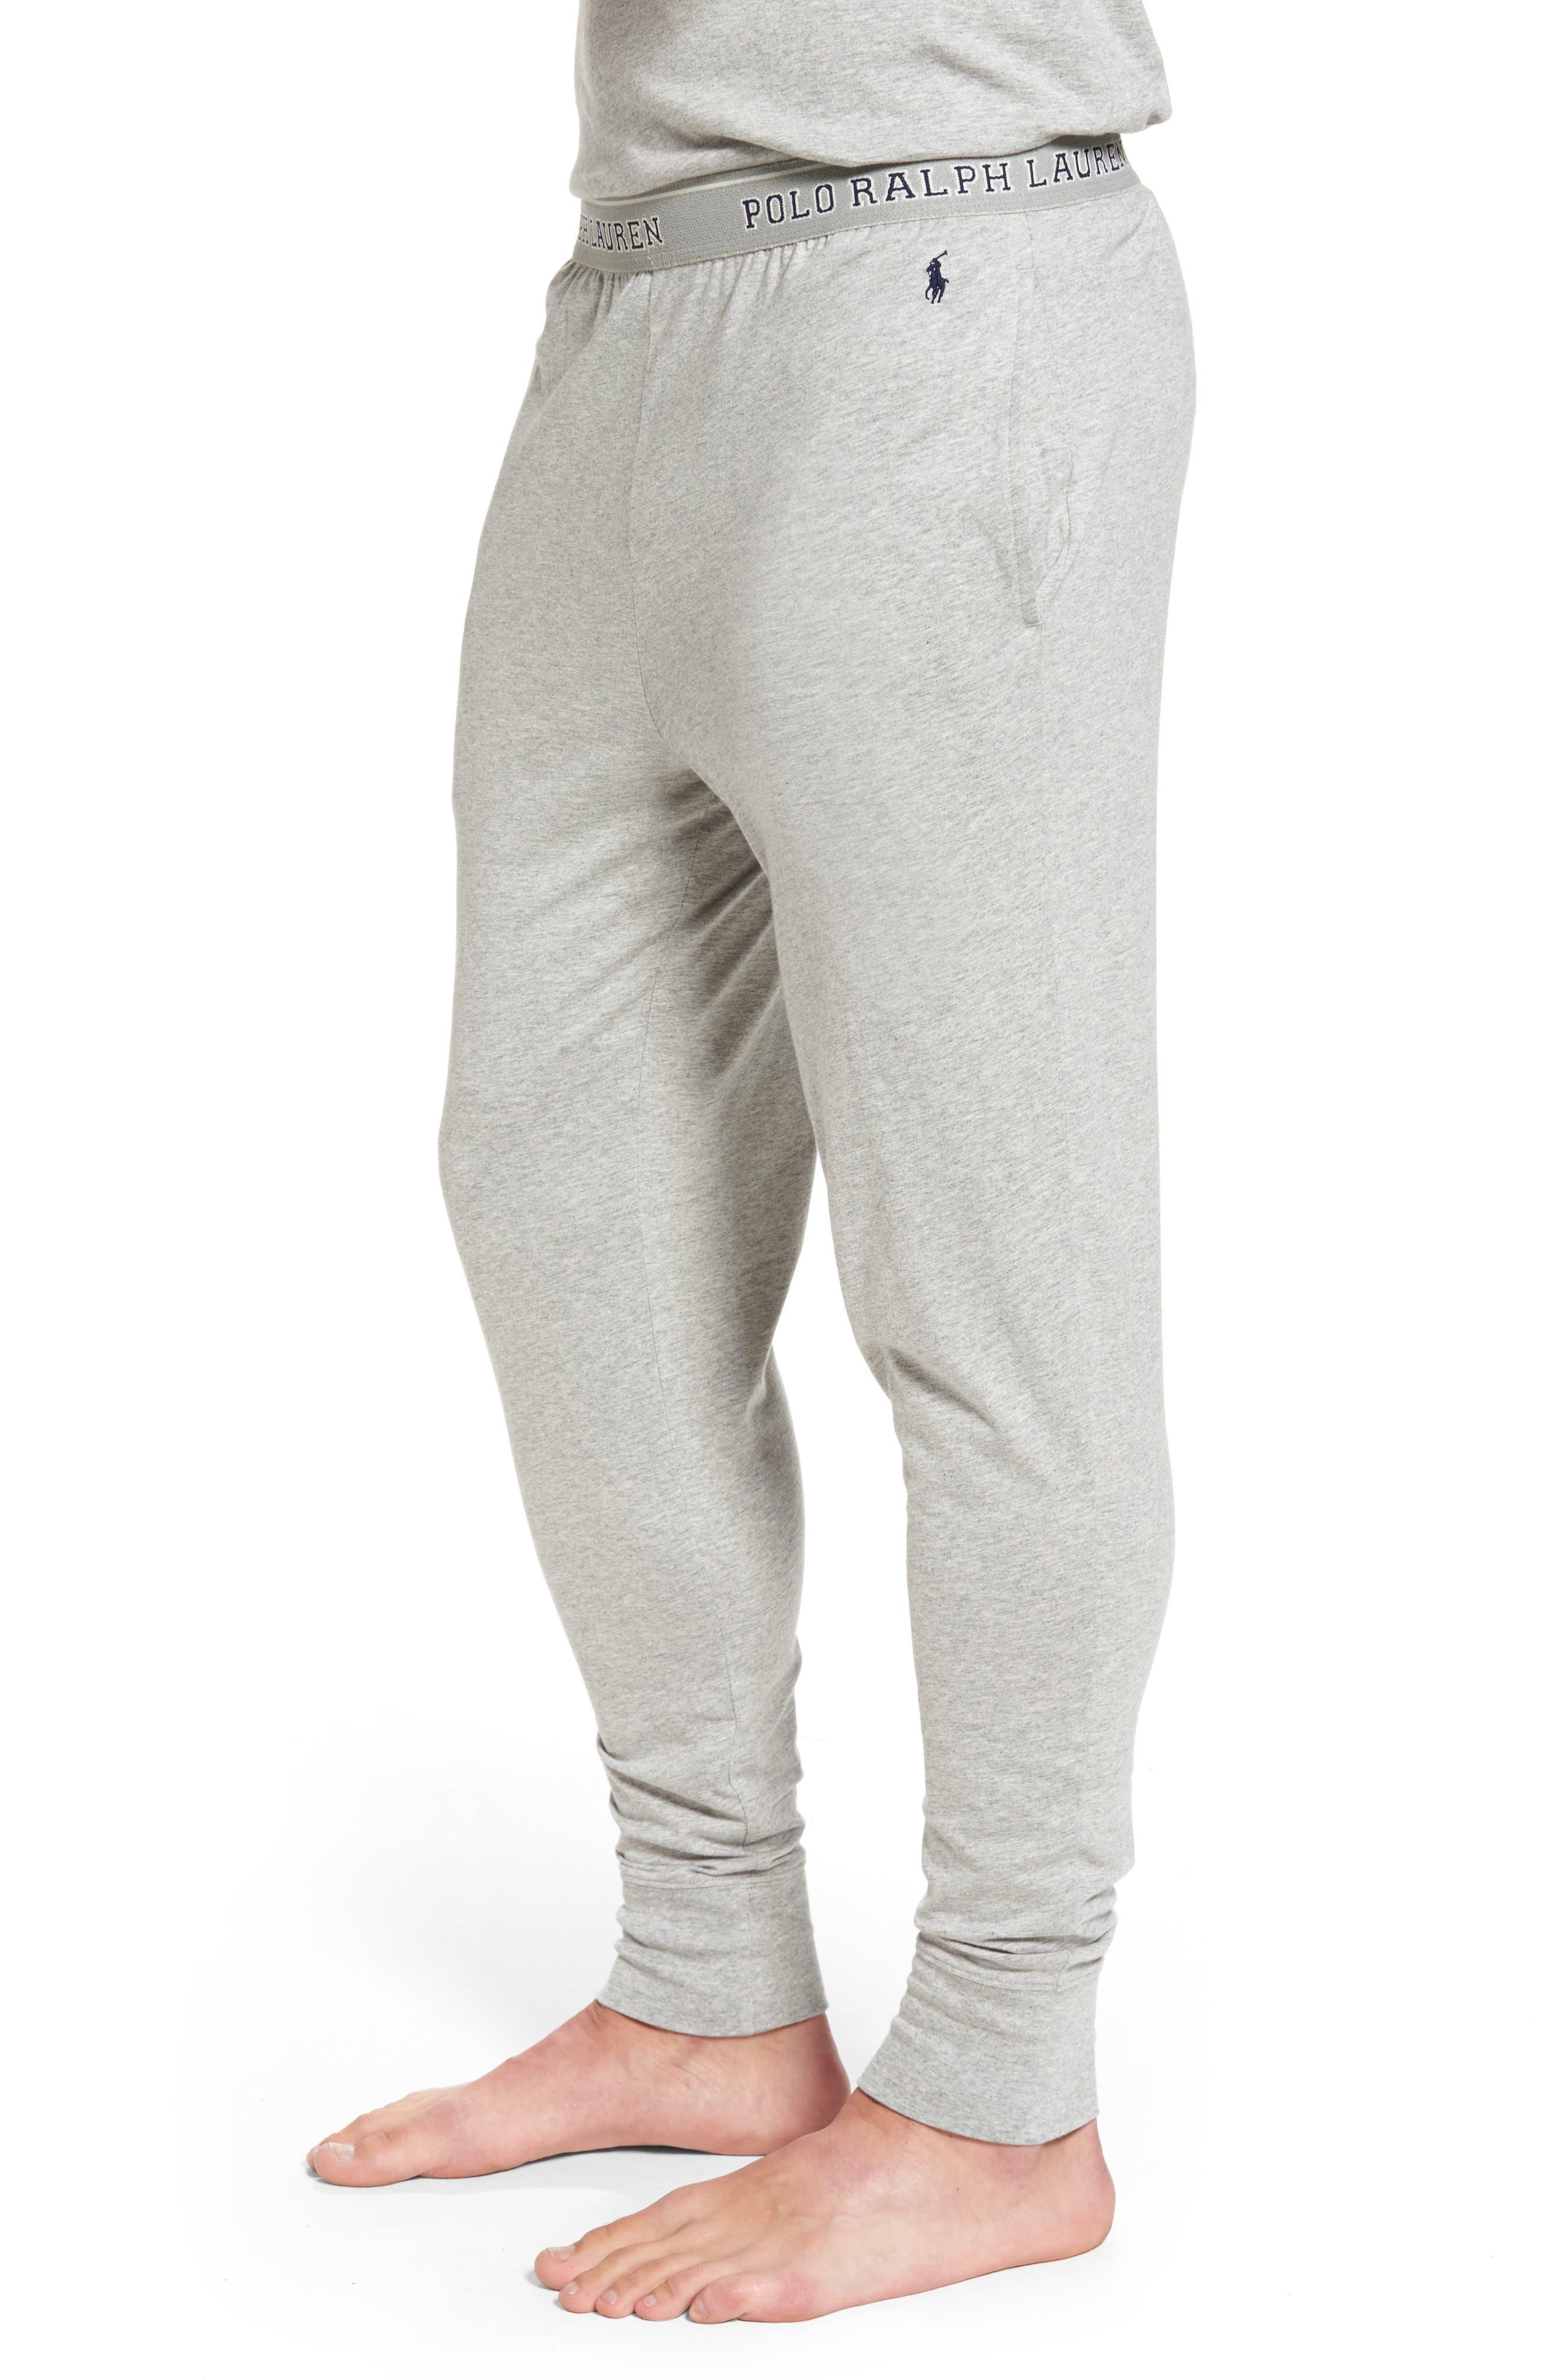 Cotton Jogger Lounge Pants,                             Alternate thumbnail 3, color,                             Andover Heather